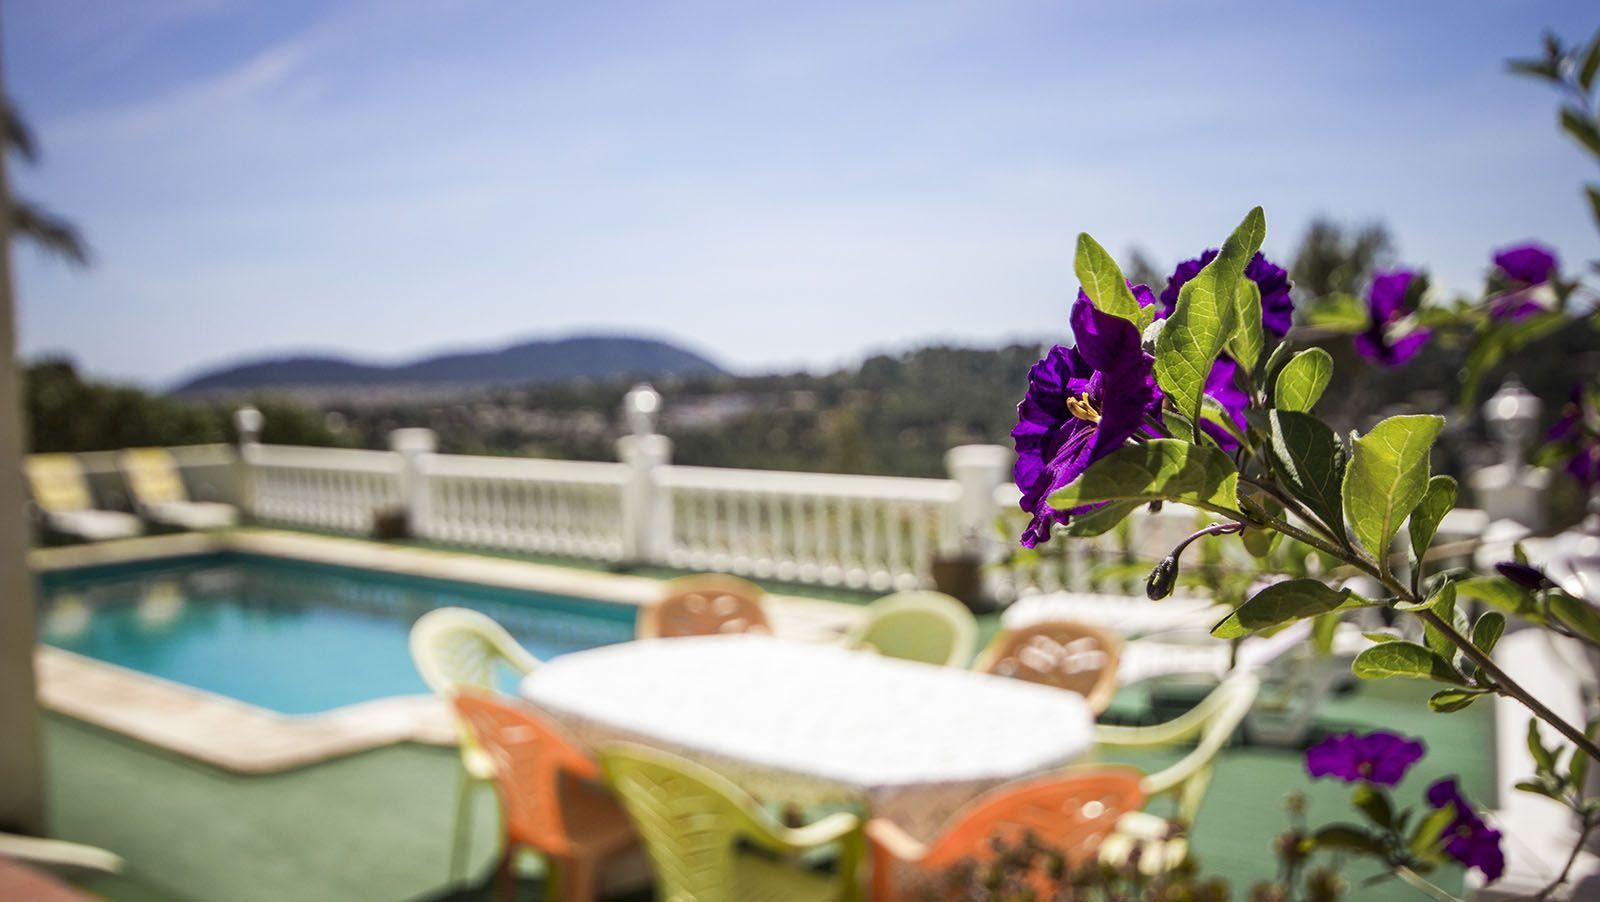 Gepflegte Villa Mallorca in beliebter Lage! http://www.casanova-immobilienmallorca.de/de/villa-haus/2551448/Immobilien-Mallorca-Villa-mit-Panoramablick-